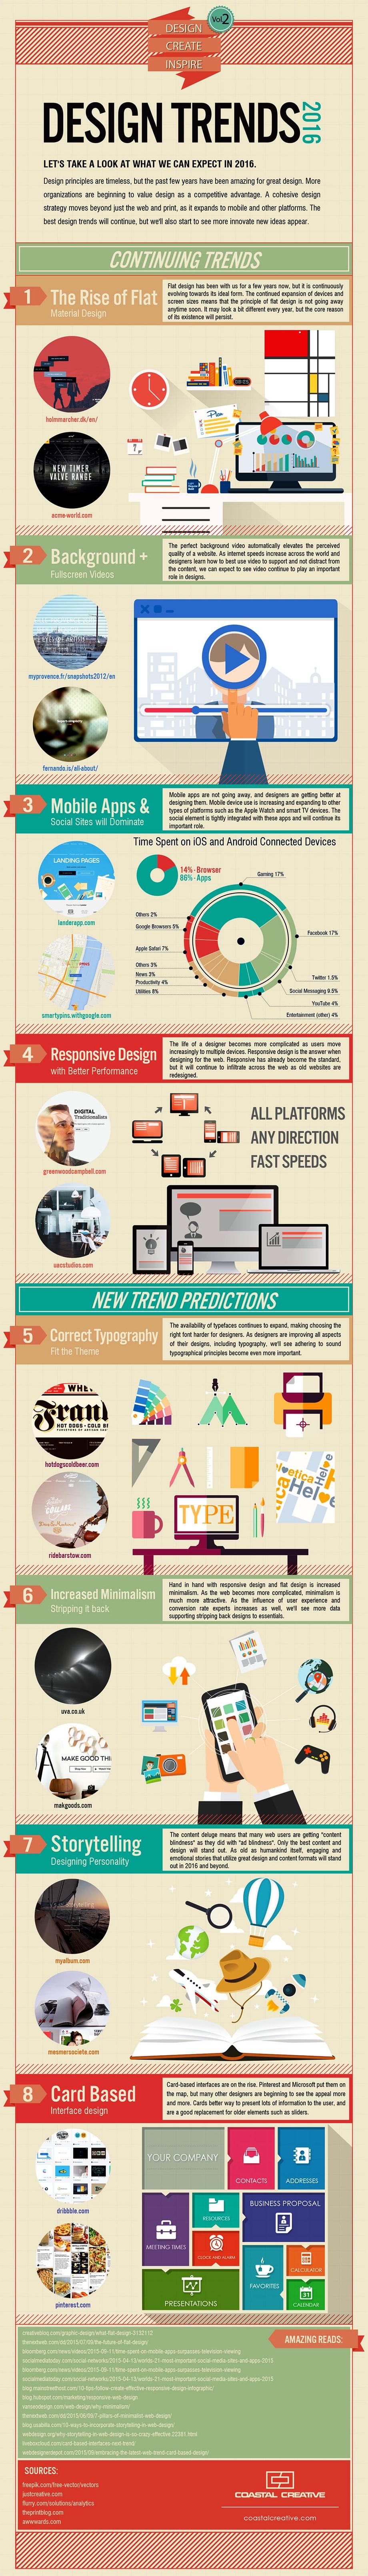 designtrends-2016-infographic